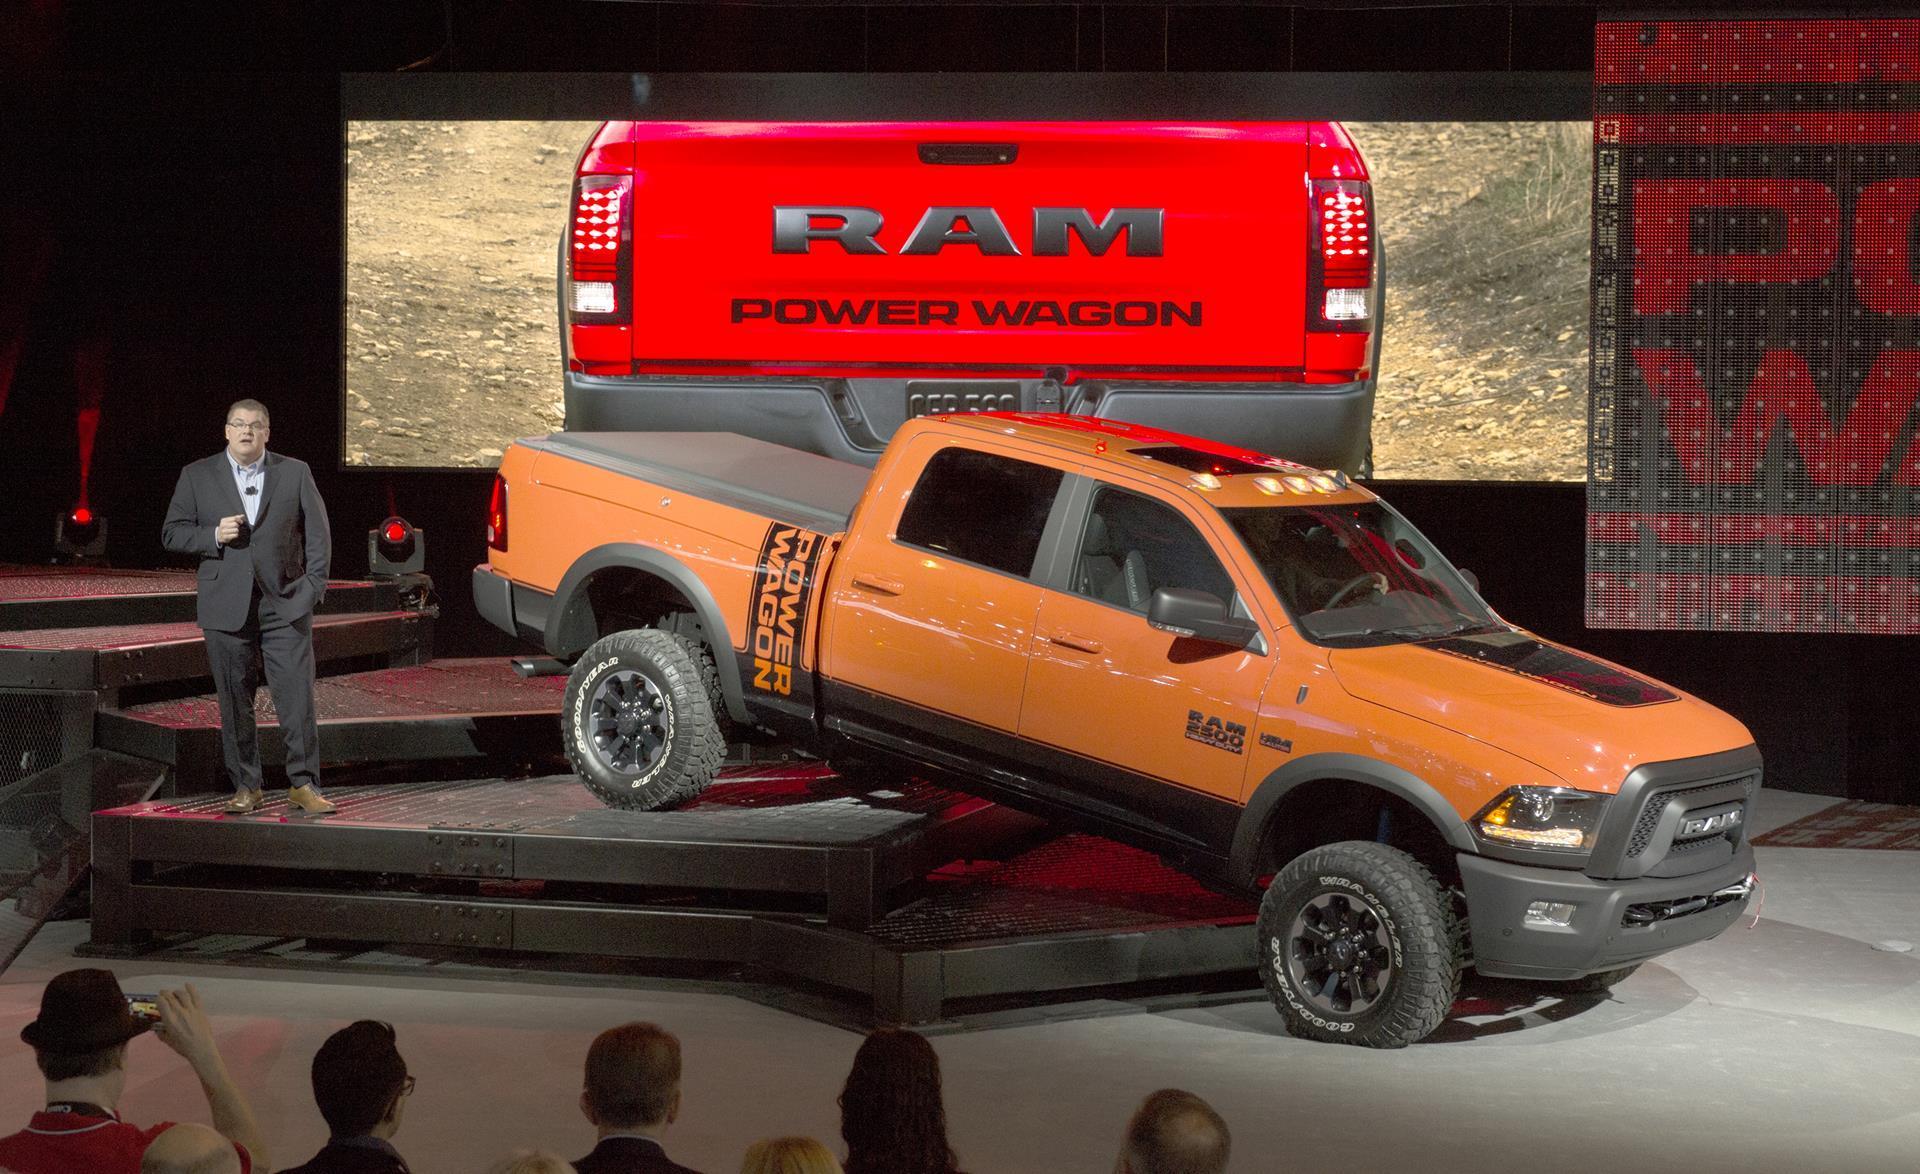 2017 ram power wagon images photo 2017 ram power wagon truck. Black Bedroom Furniture Sets. Home Design Ideas